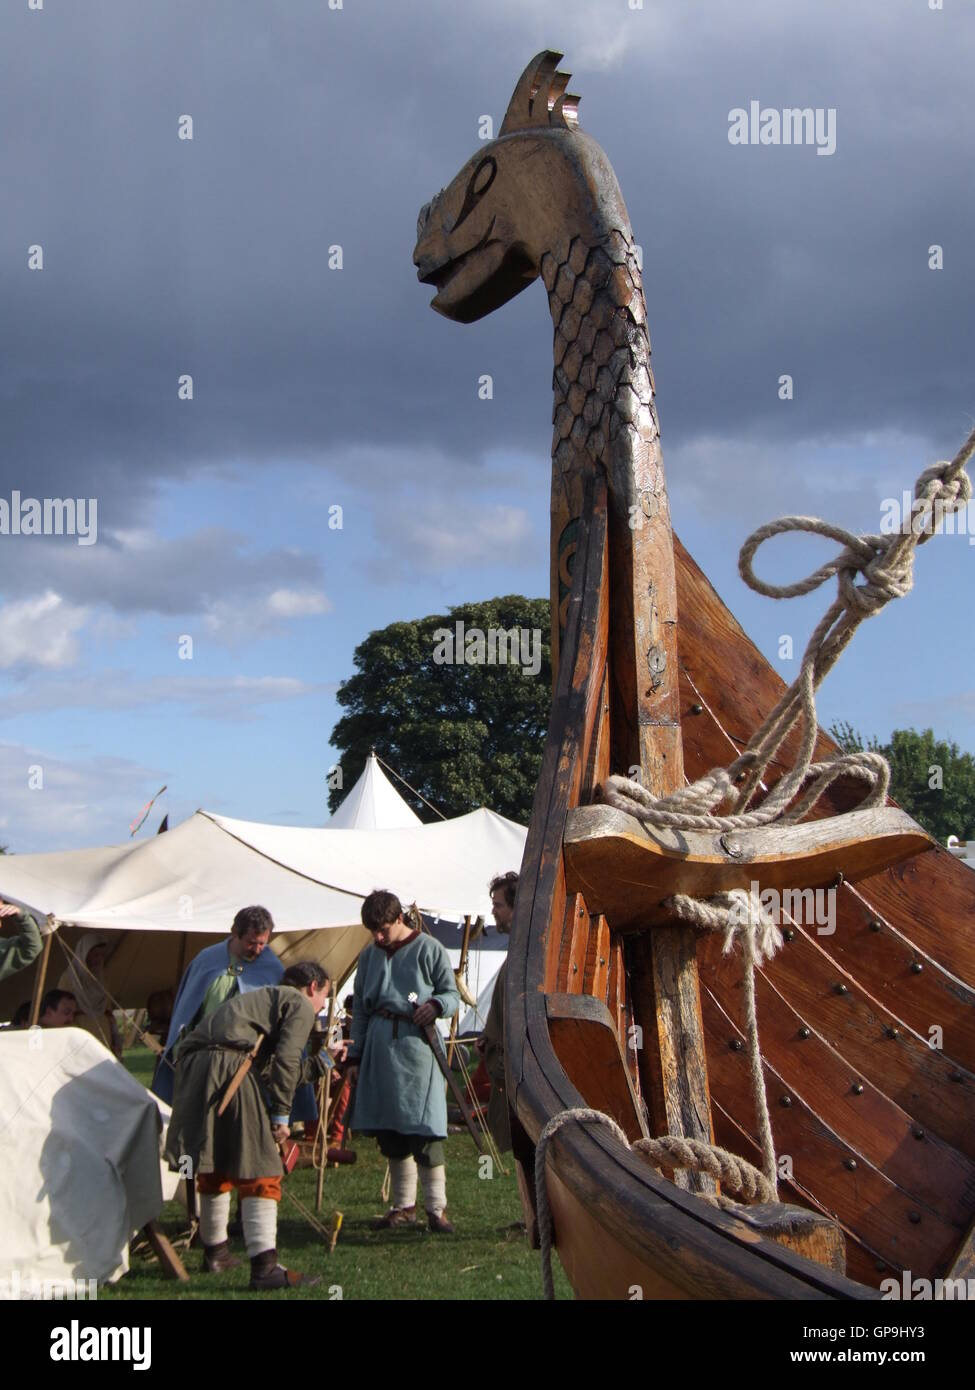 Vikings with longship - Stock Image